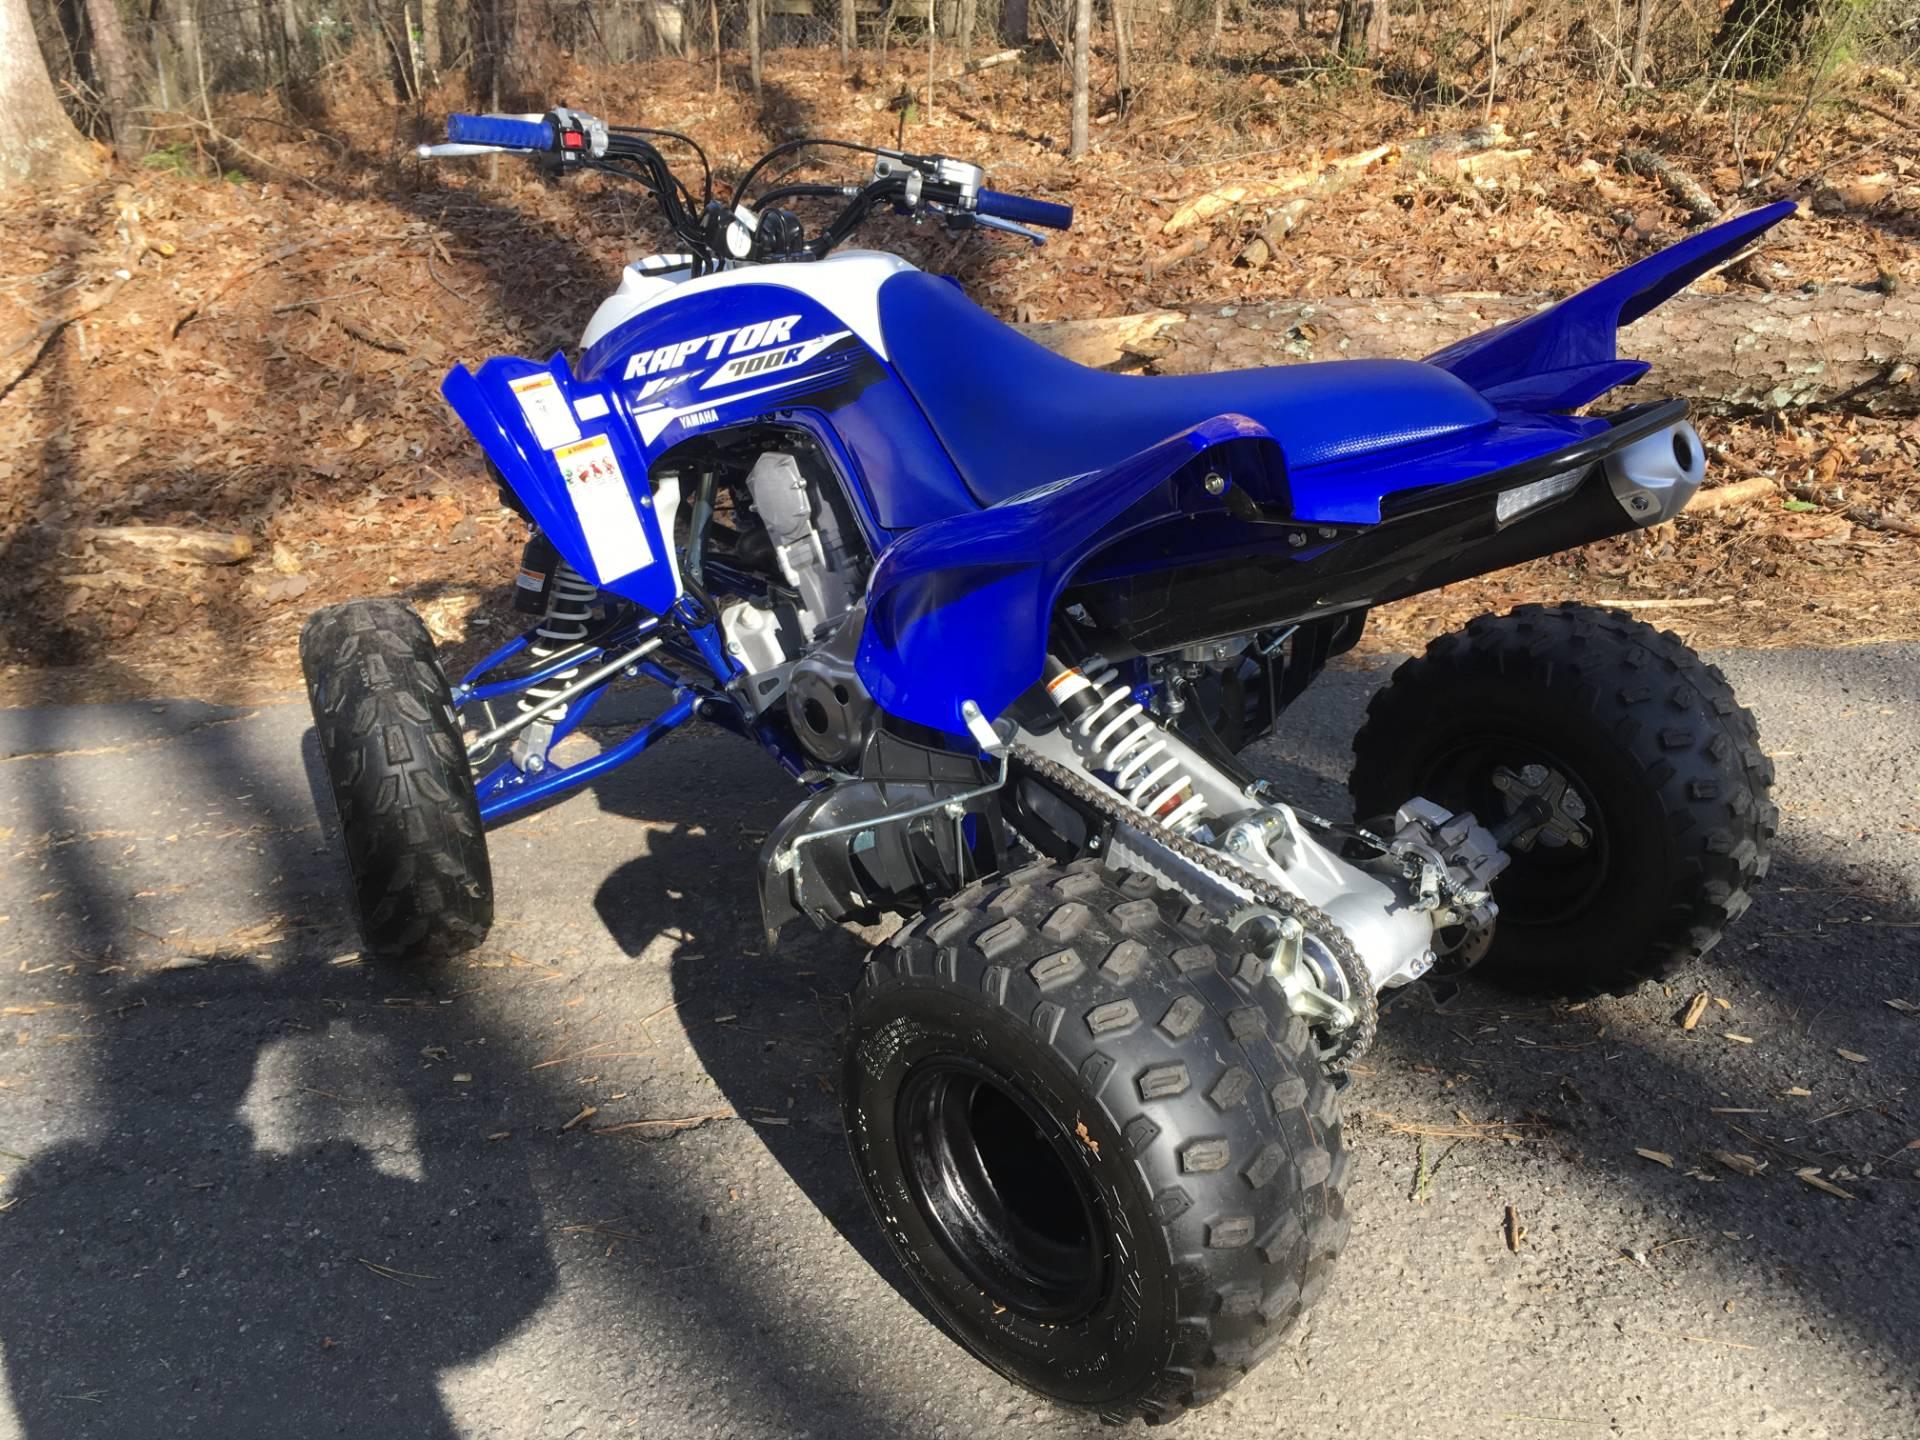 2018 Yamaha Raptor 700R 3